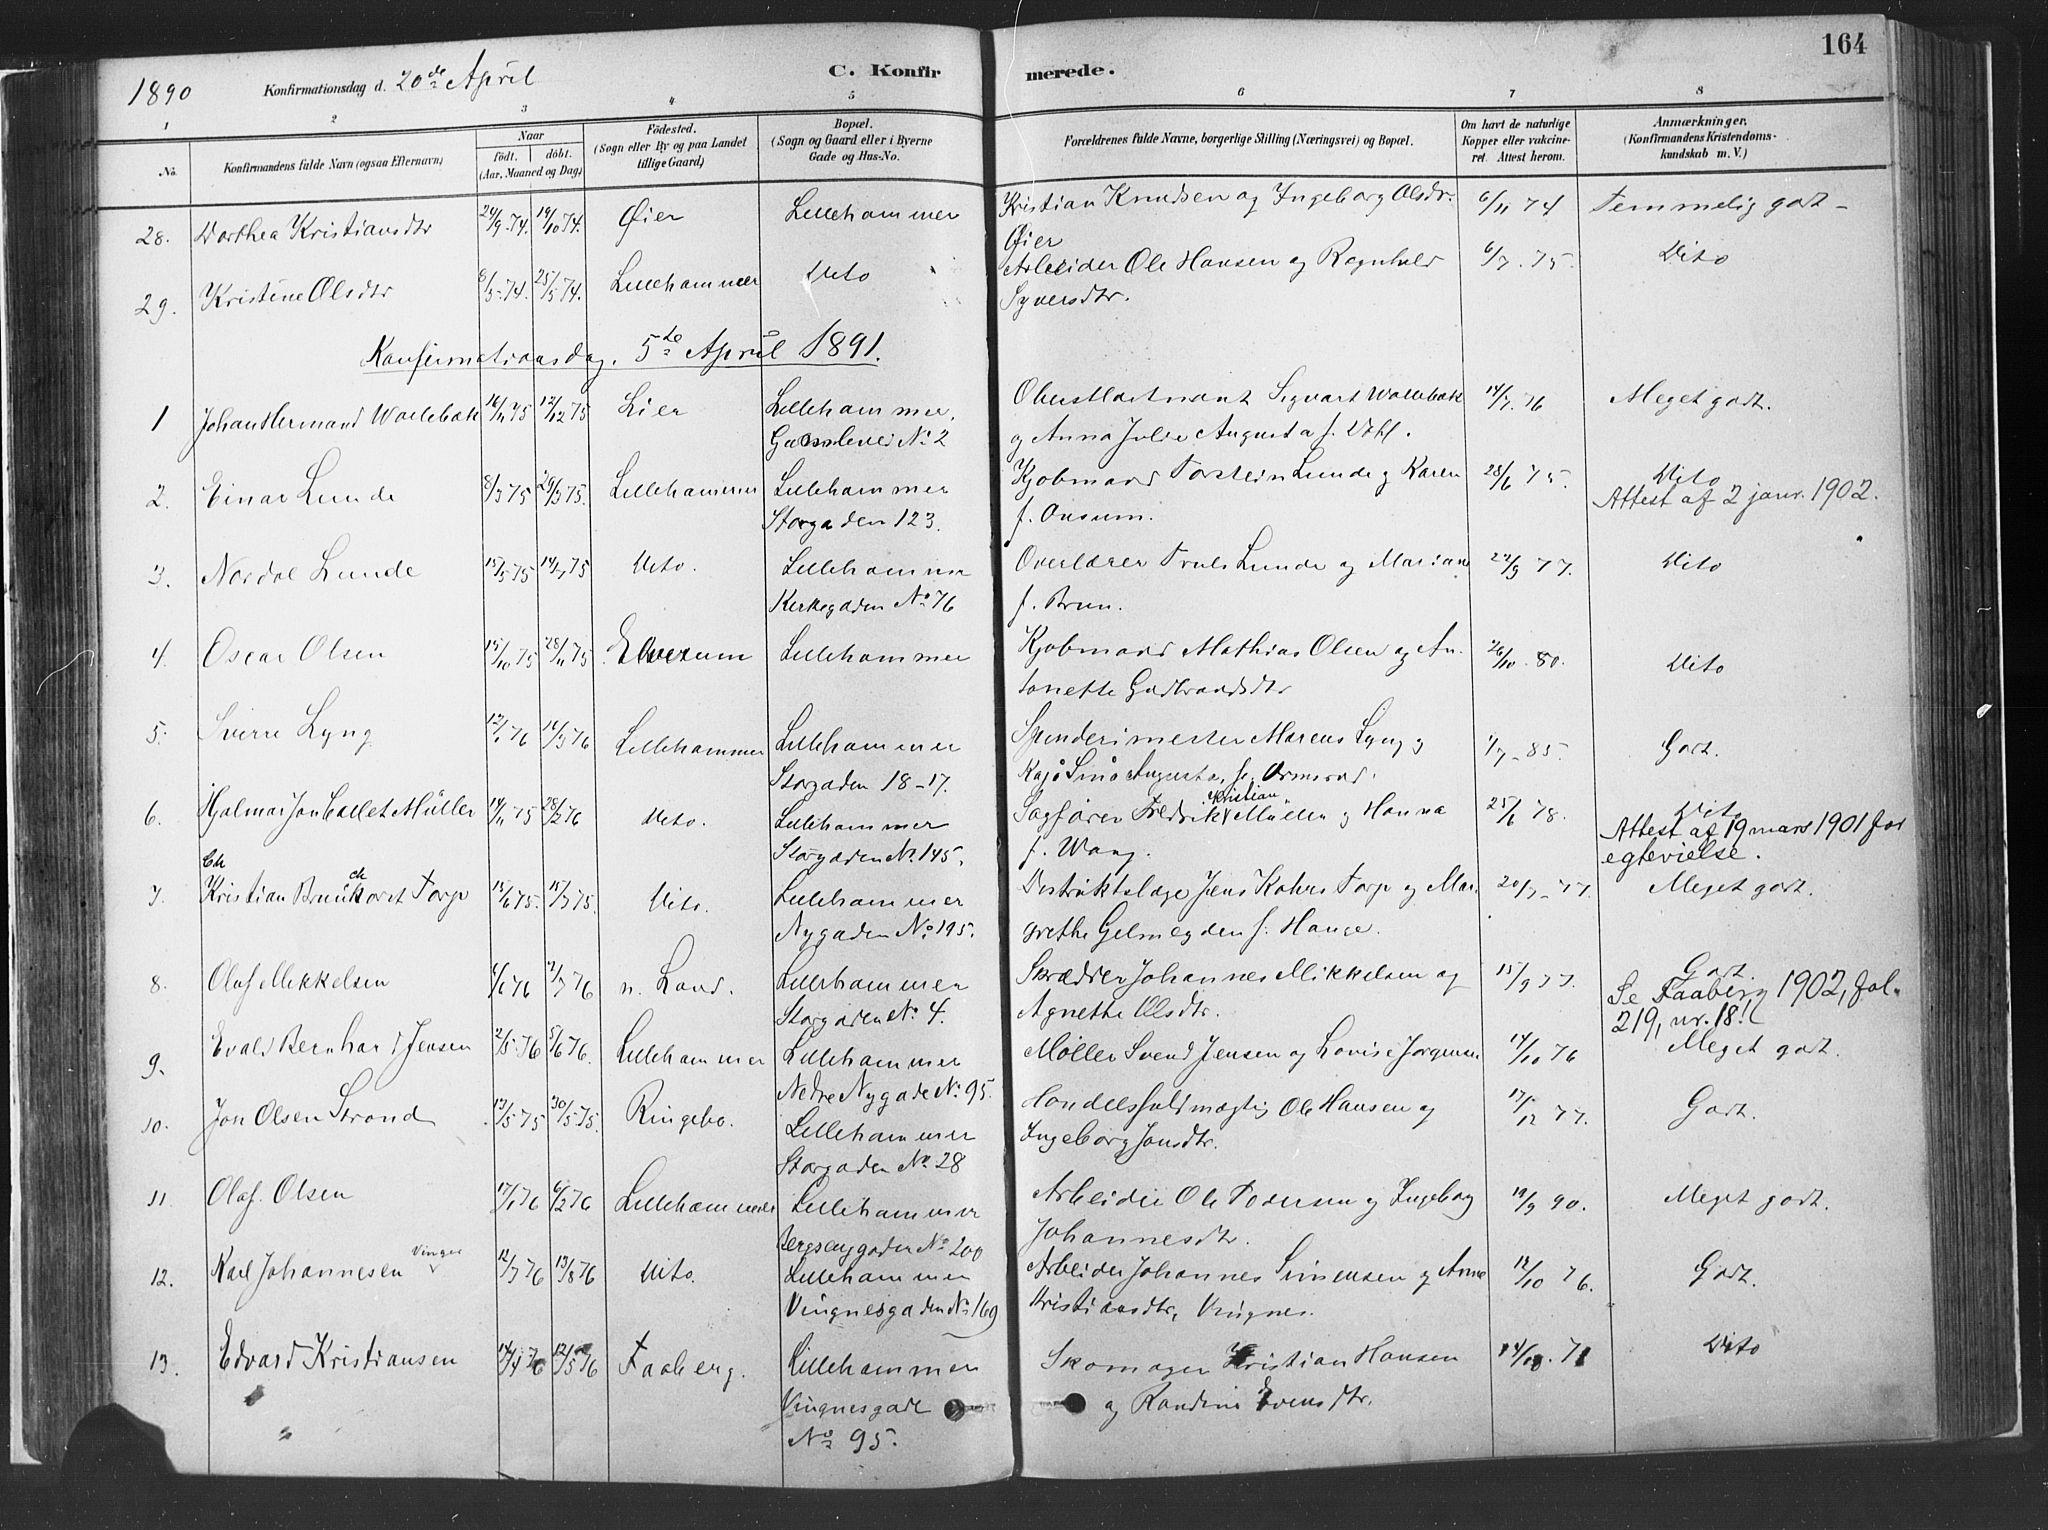 SAH, Fåberg prestekontor, Ministerialbok nr. 10, 1879-1900, s. 164